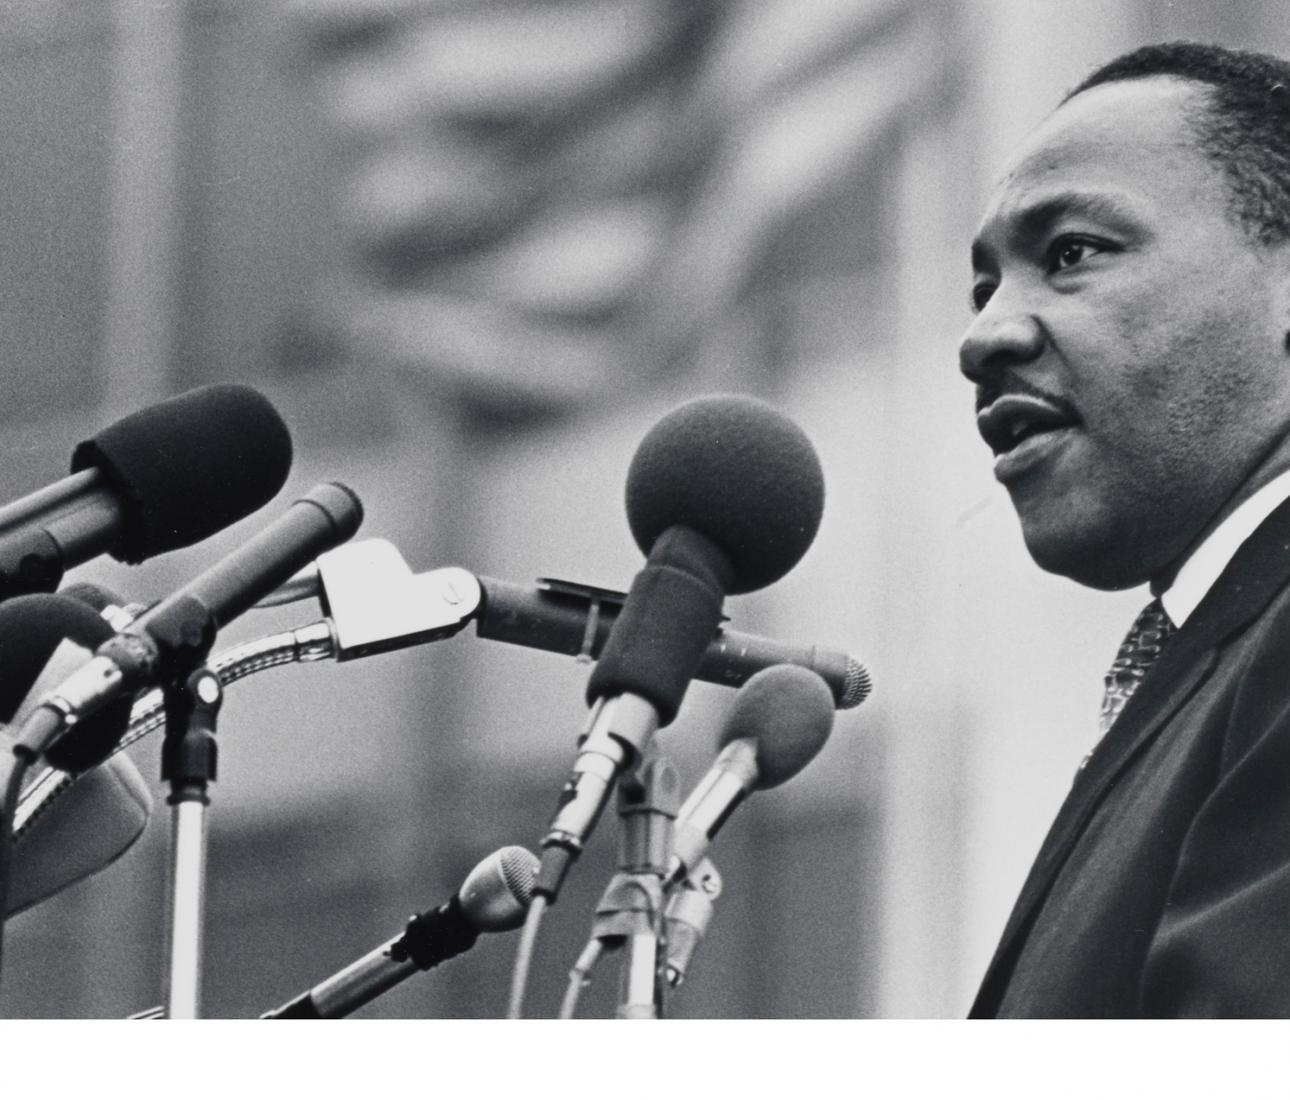 Honrando al Dr. Martin Luther King Jr.